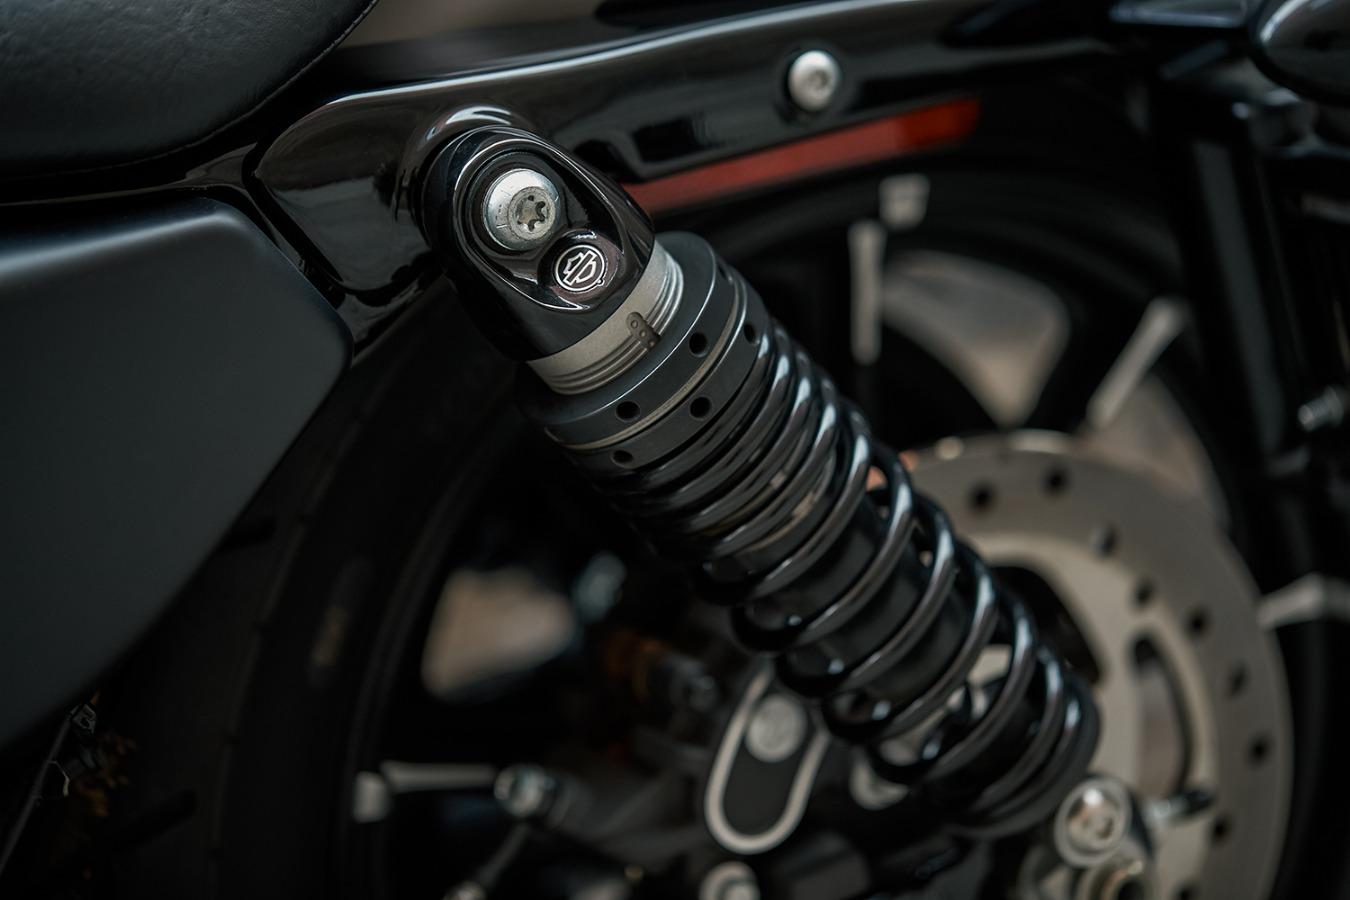 Harley-Davidson Ravenna IRON 2018